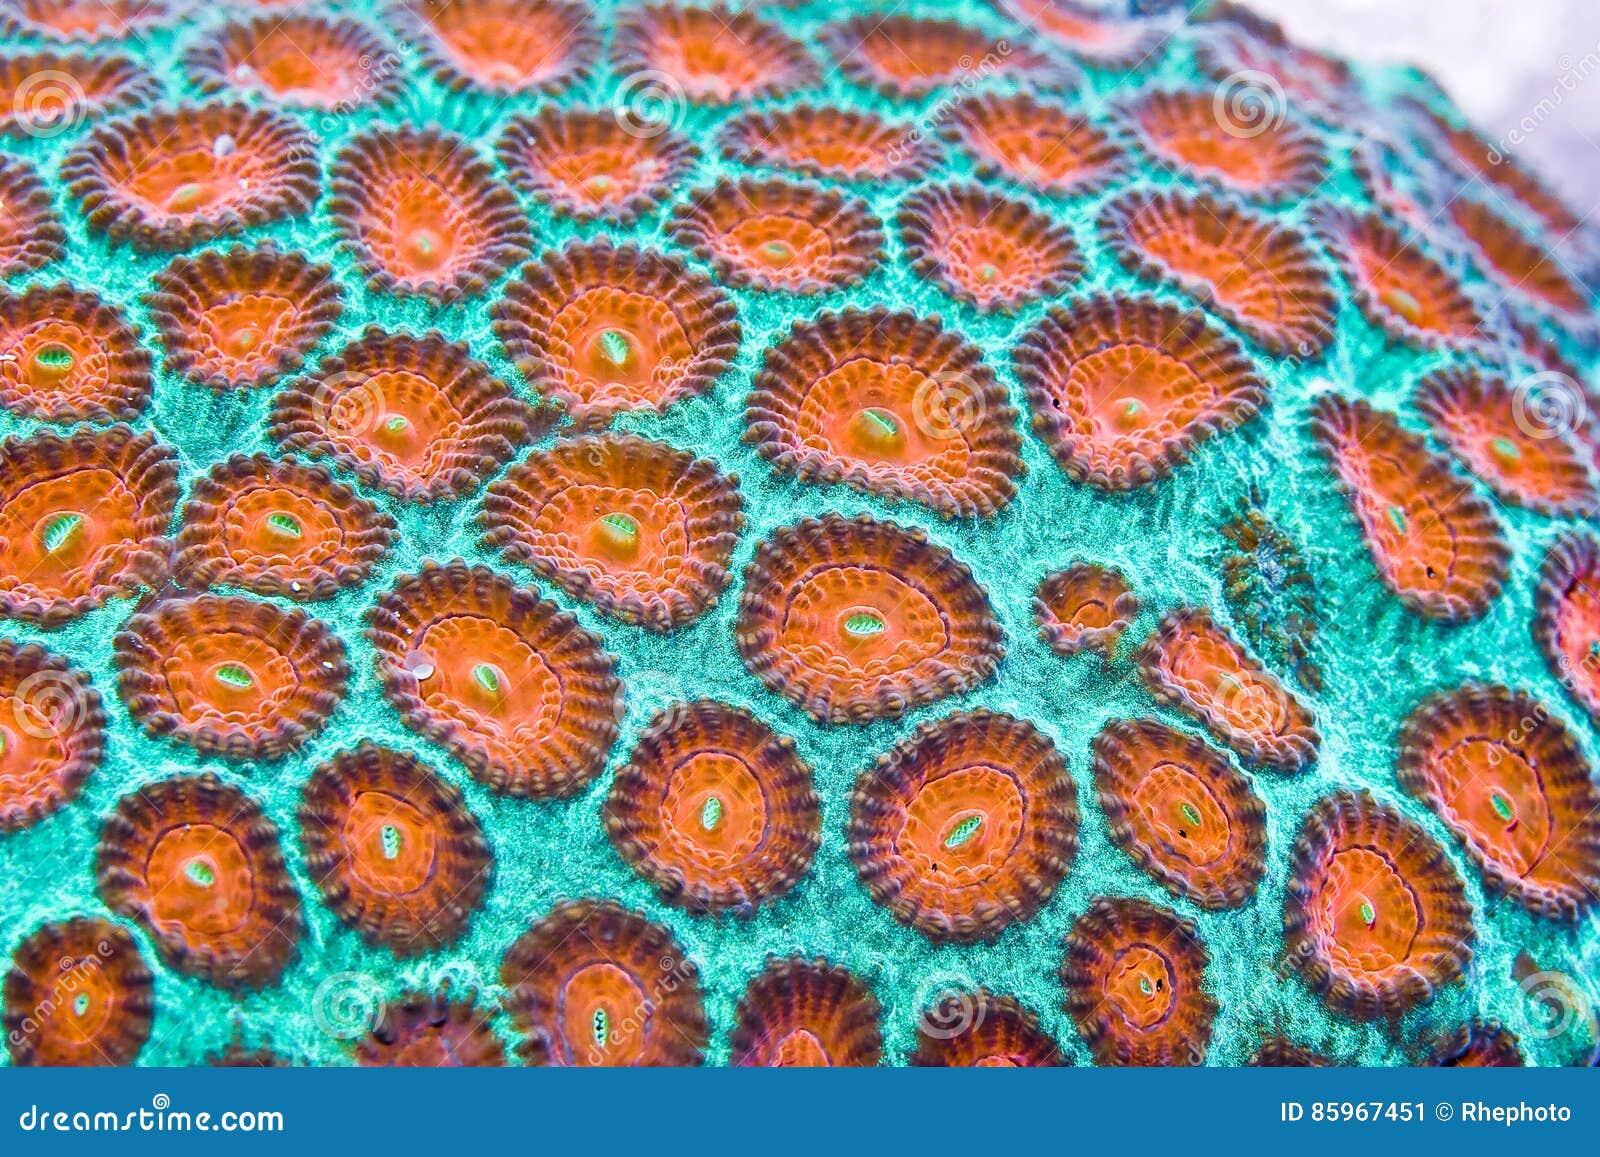 Coral duro imagen de archivo. Imagen de primers, agua - 85967451